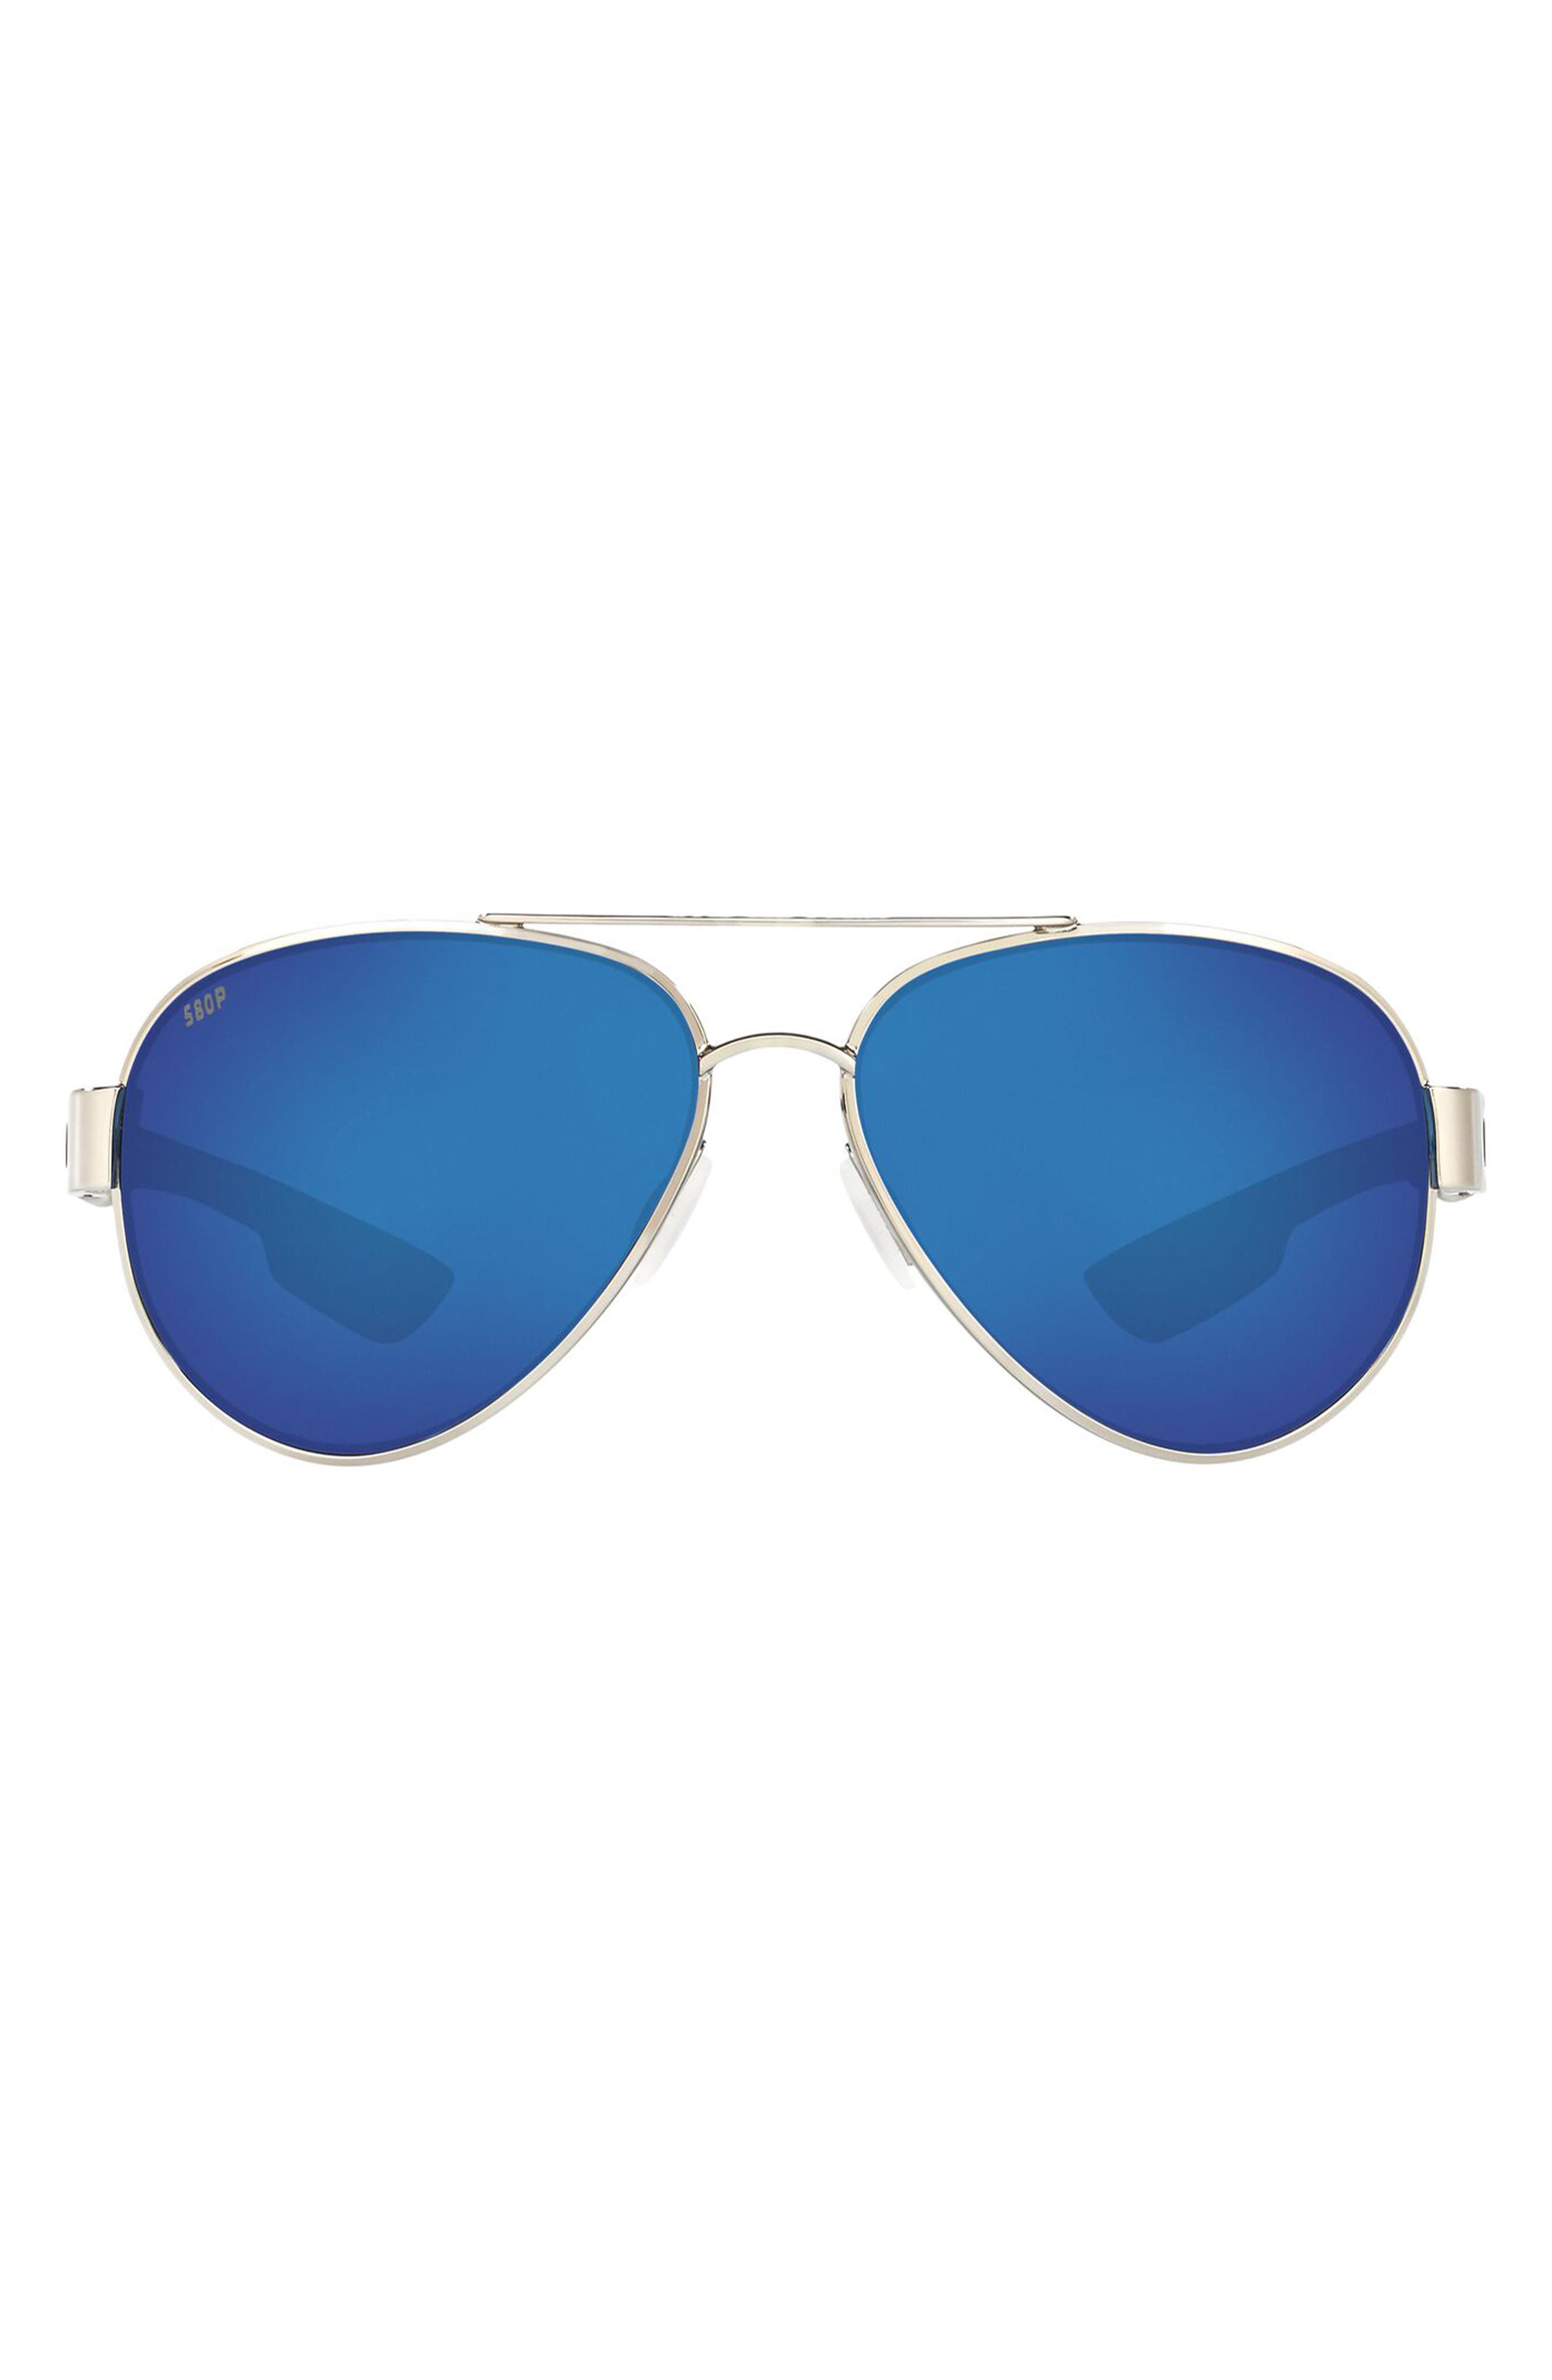 59mm Polarized Pilot Sunglasses